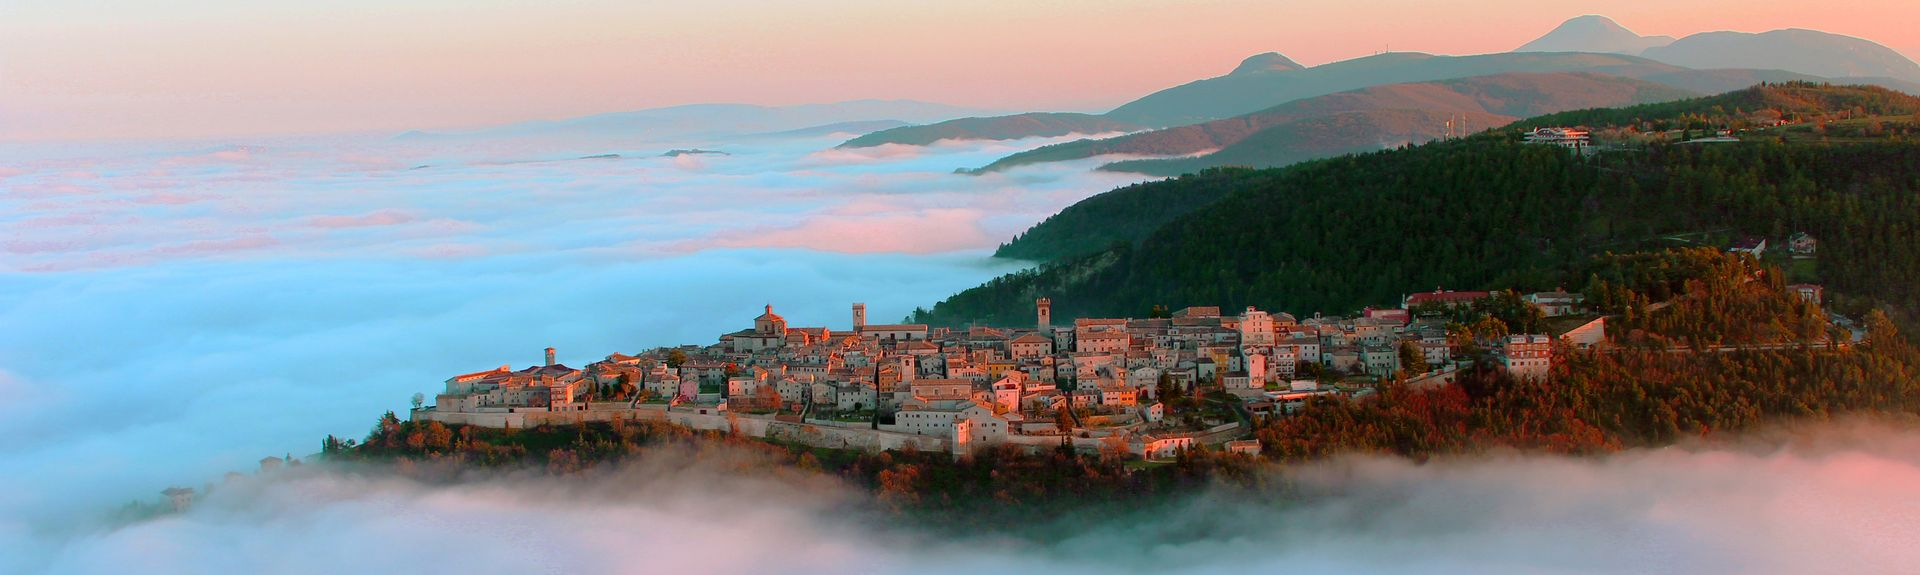 Castelplanio, Marche, Italien